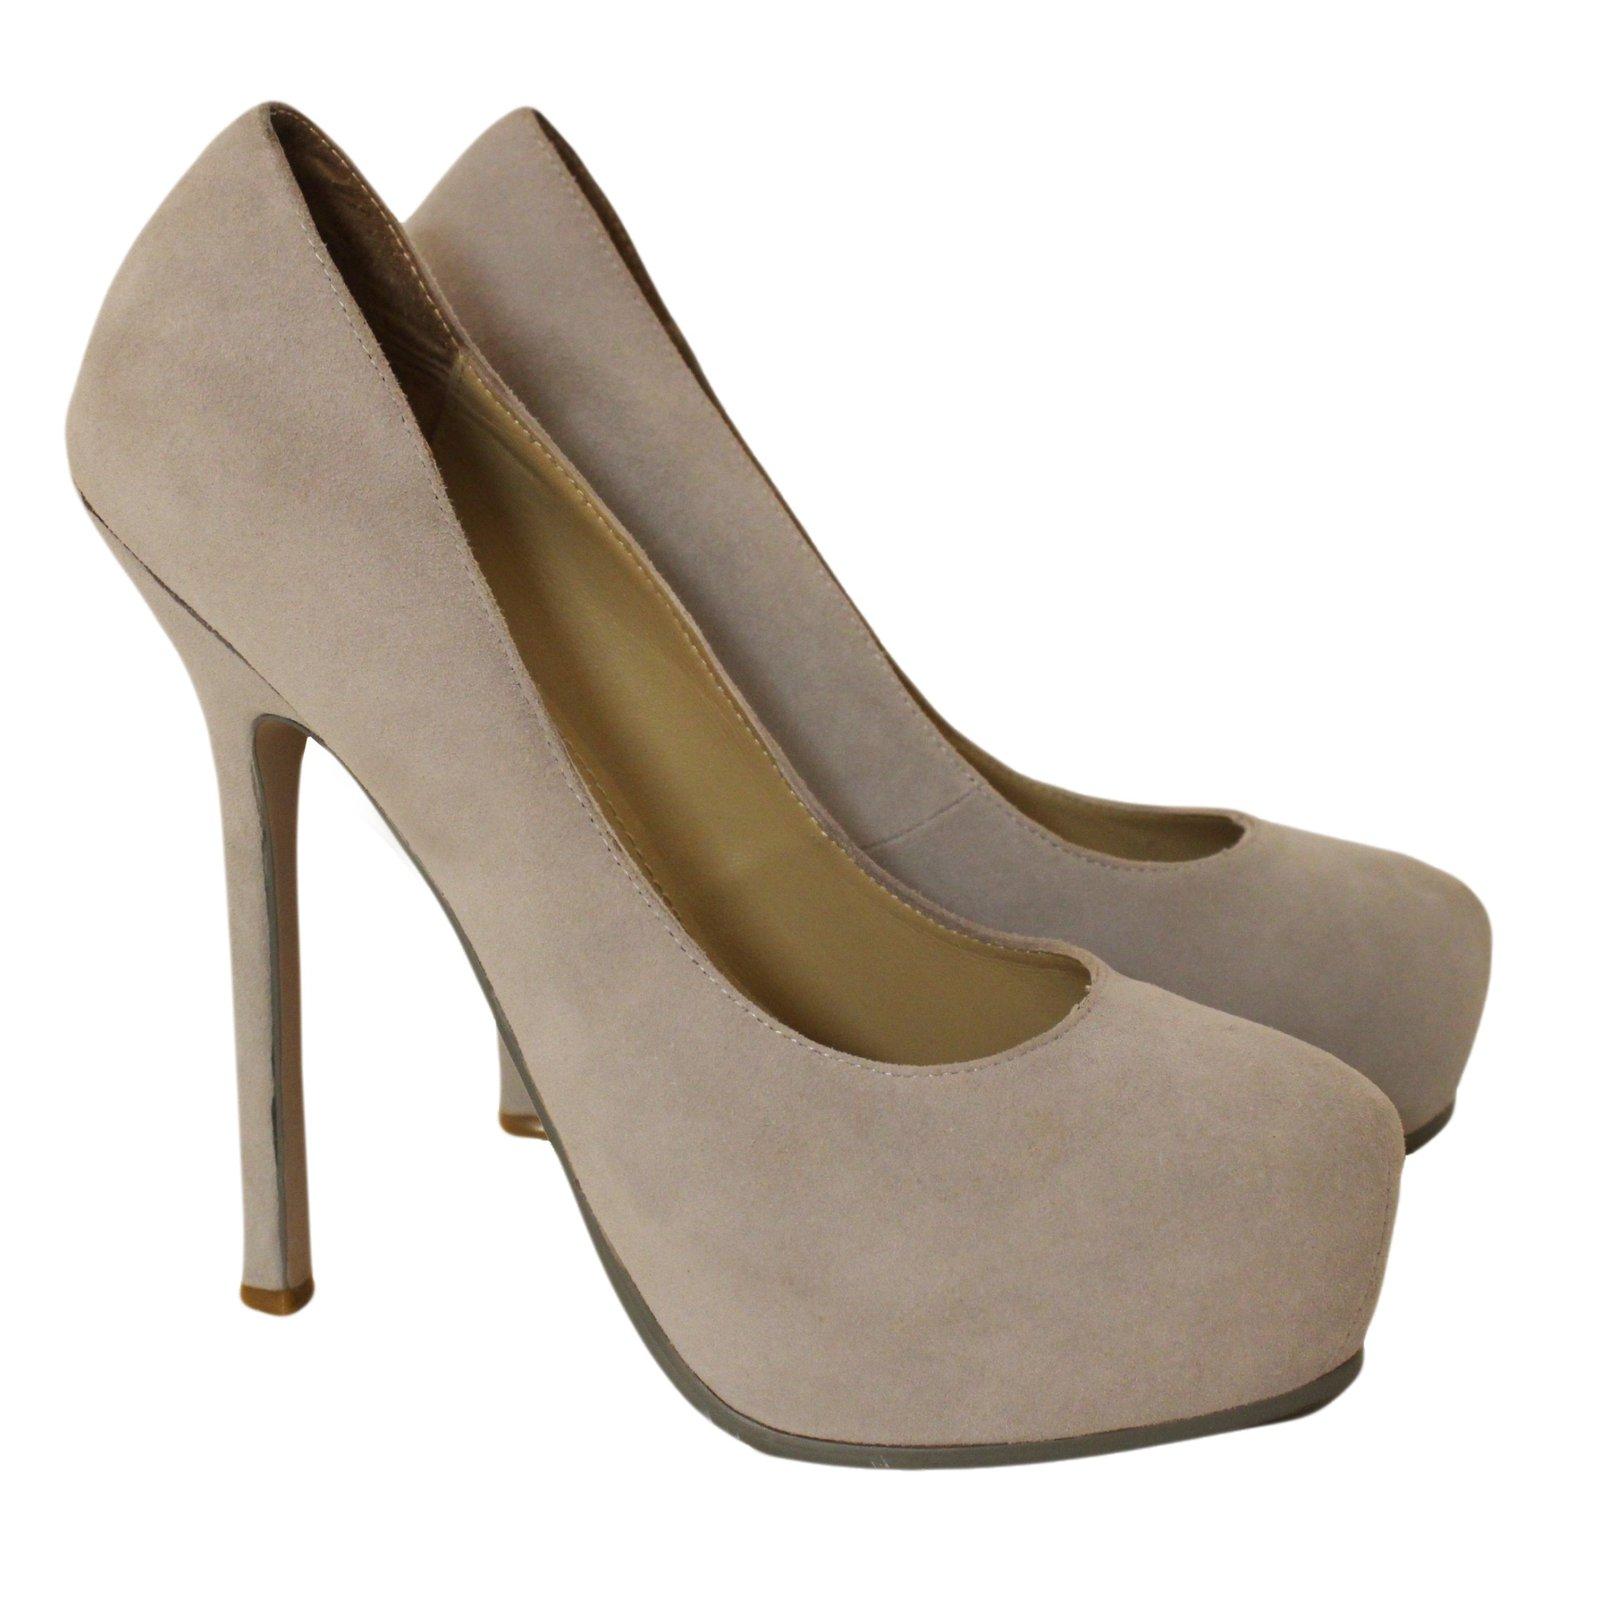 311d72598b4 Yves Saint Laurent Trib Too Heels Suede Grey ref.53913 - Joli Closet